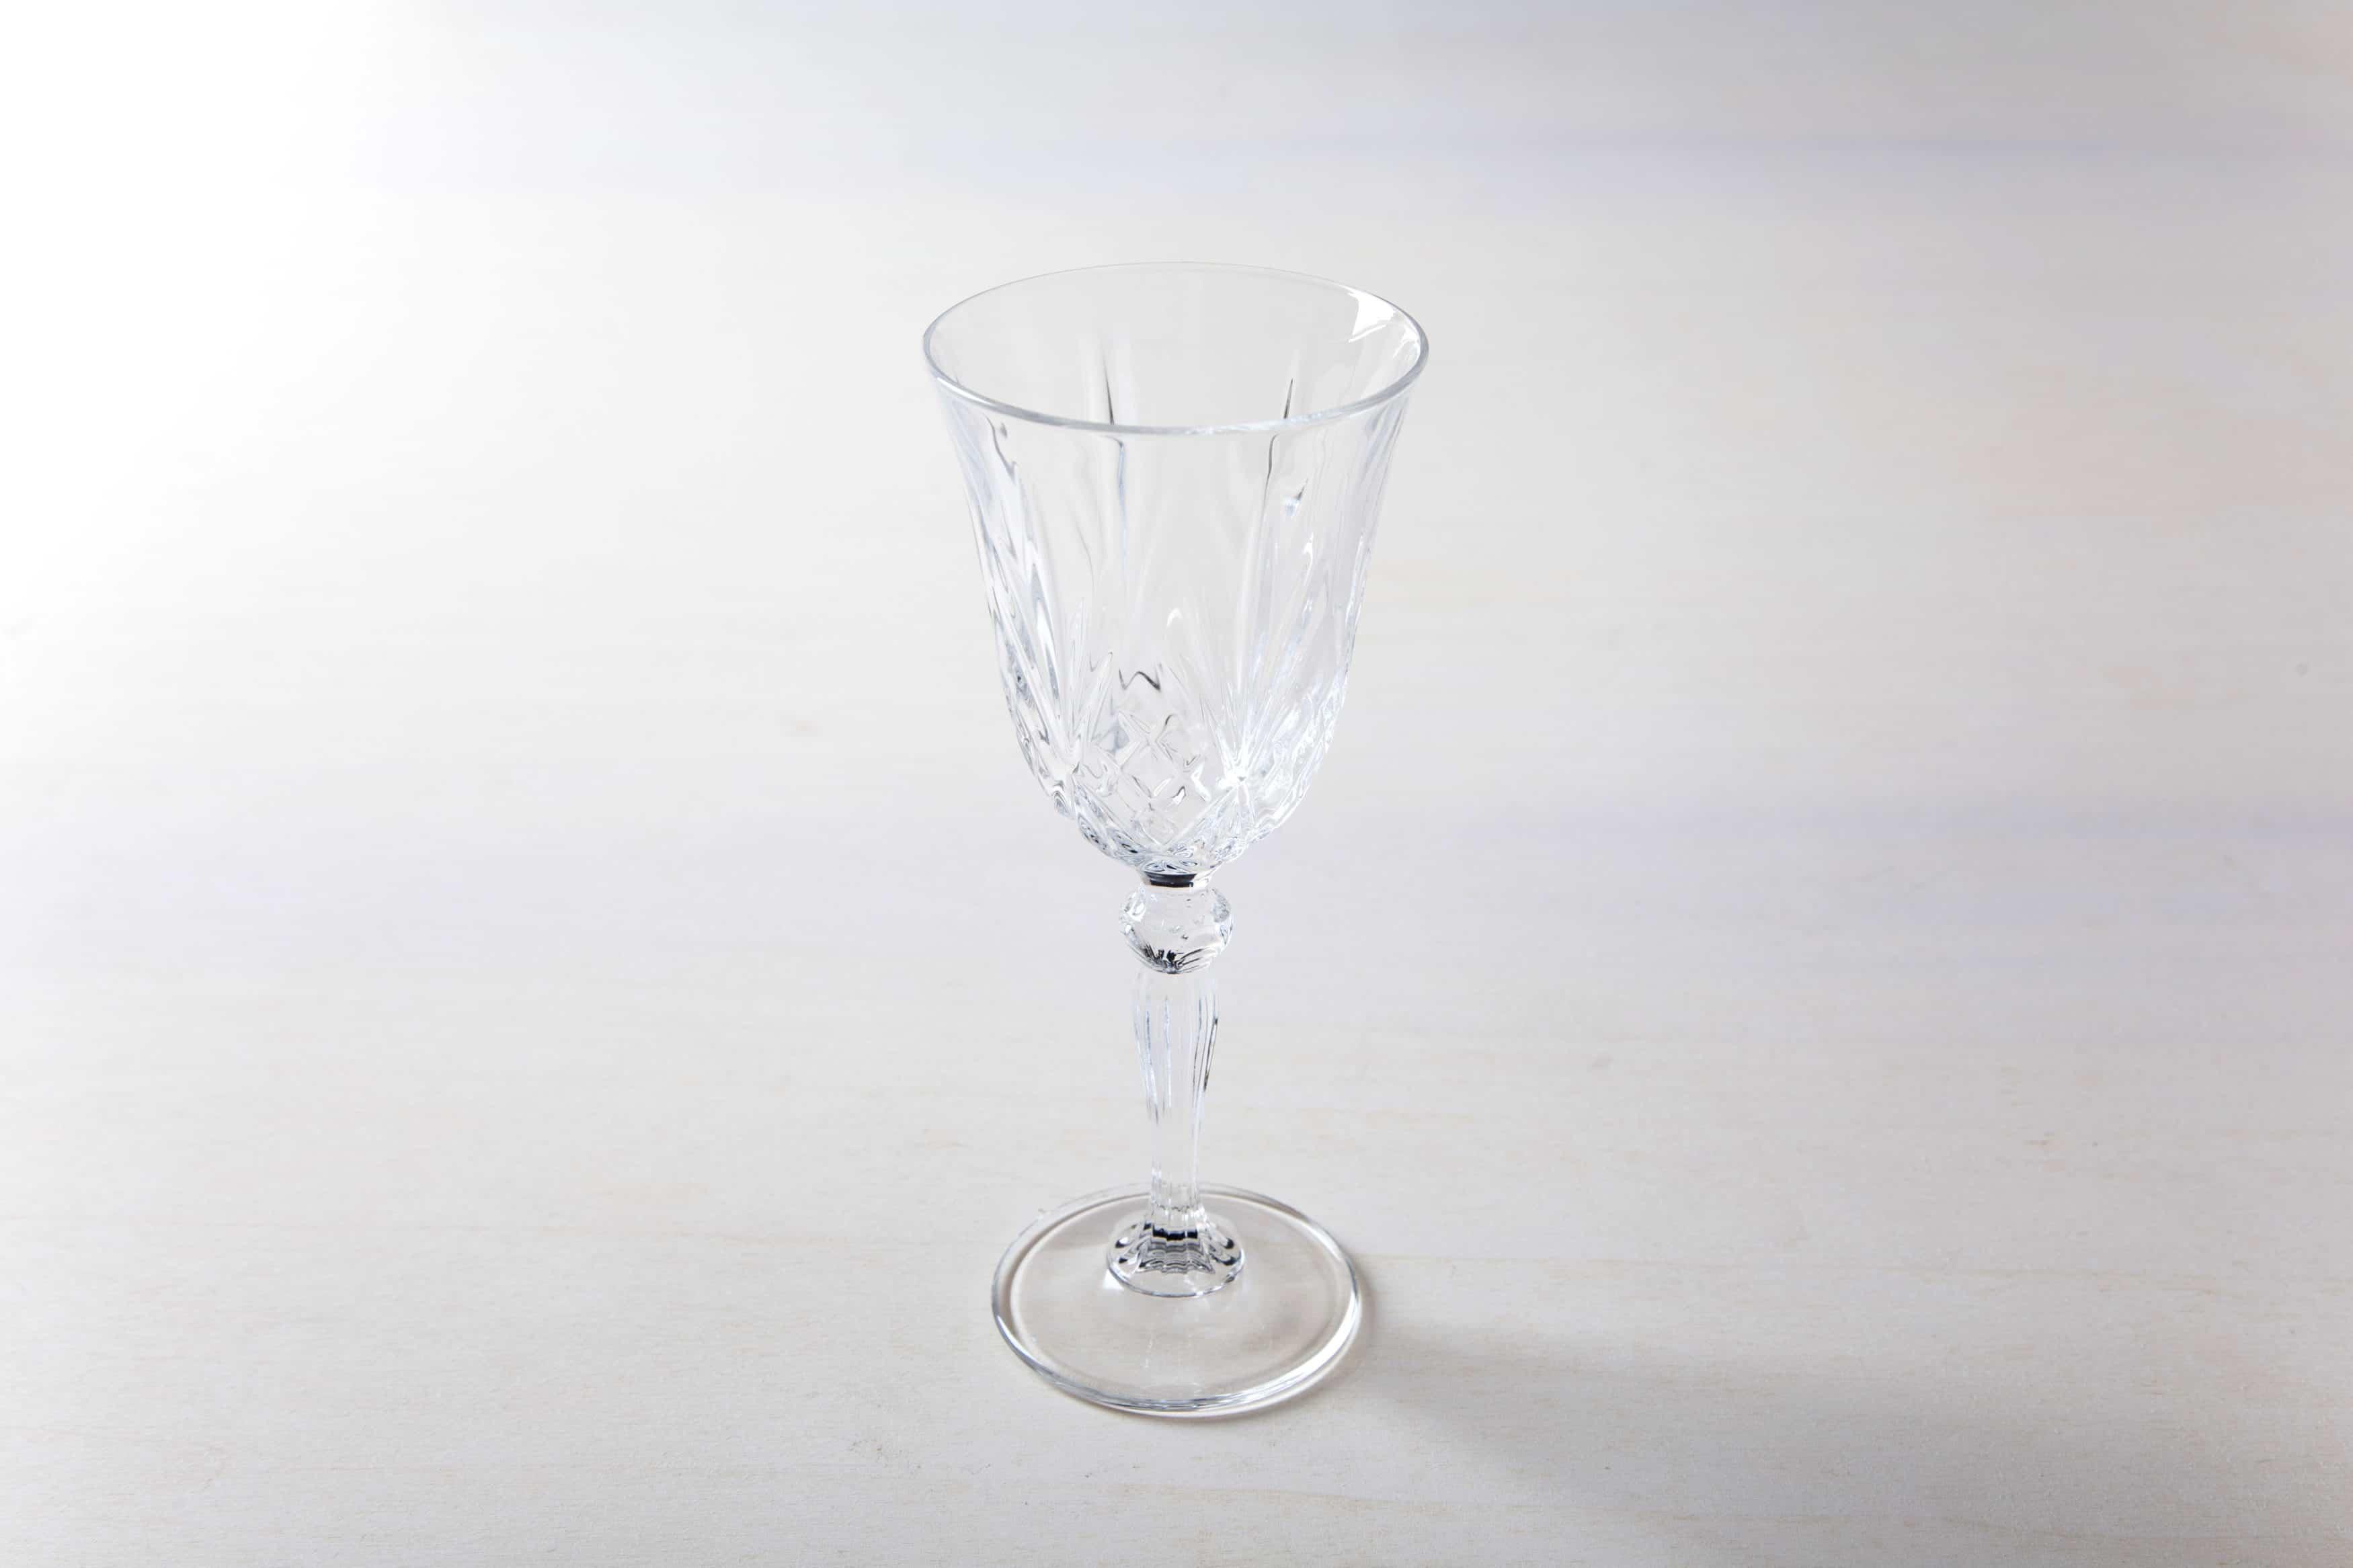 Weißweinglas im Retrostil. Kristallglas.